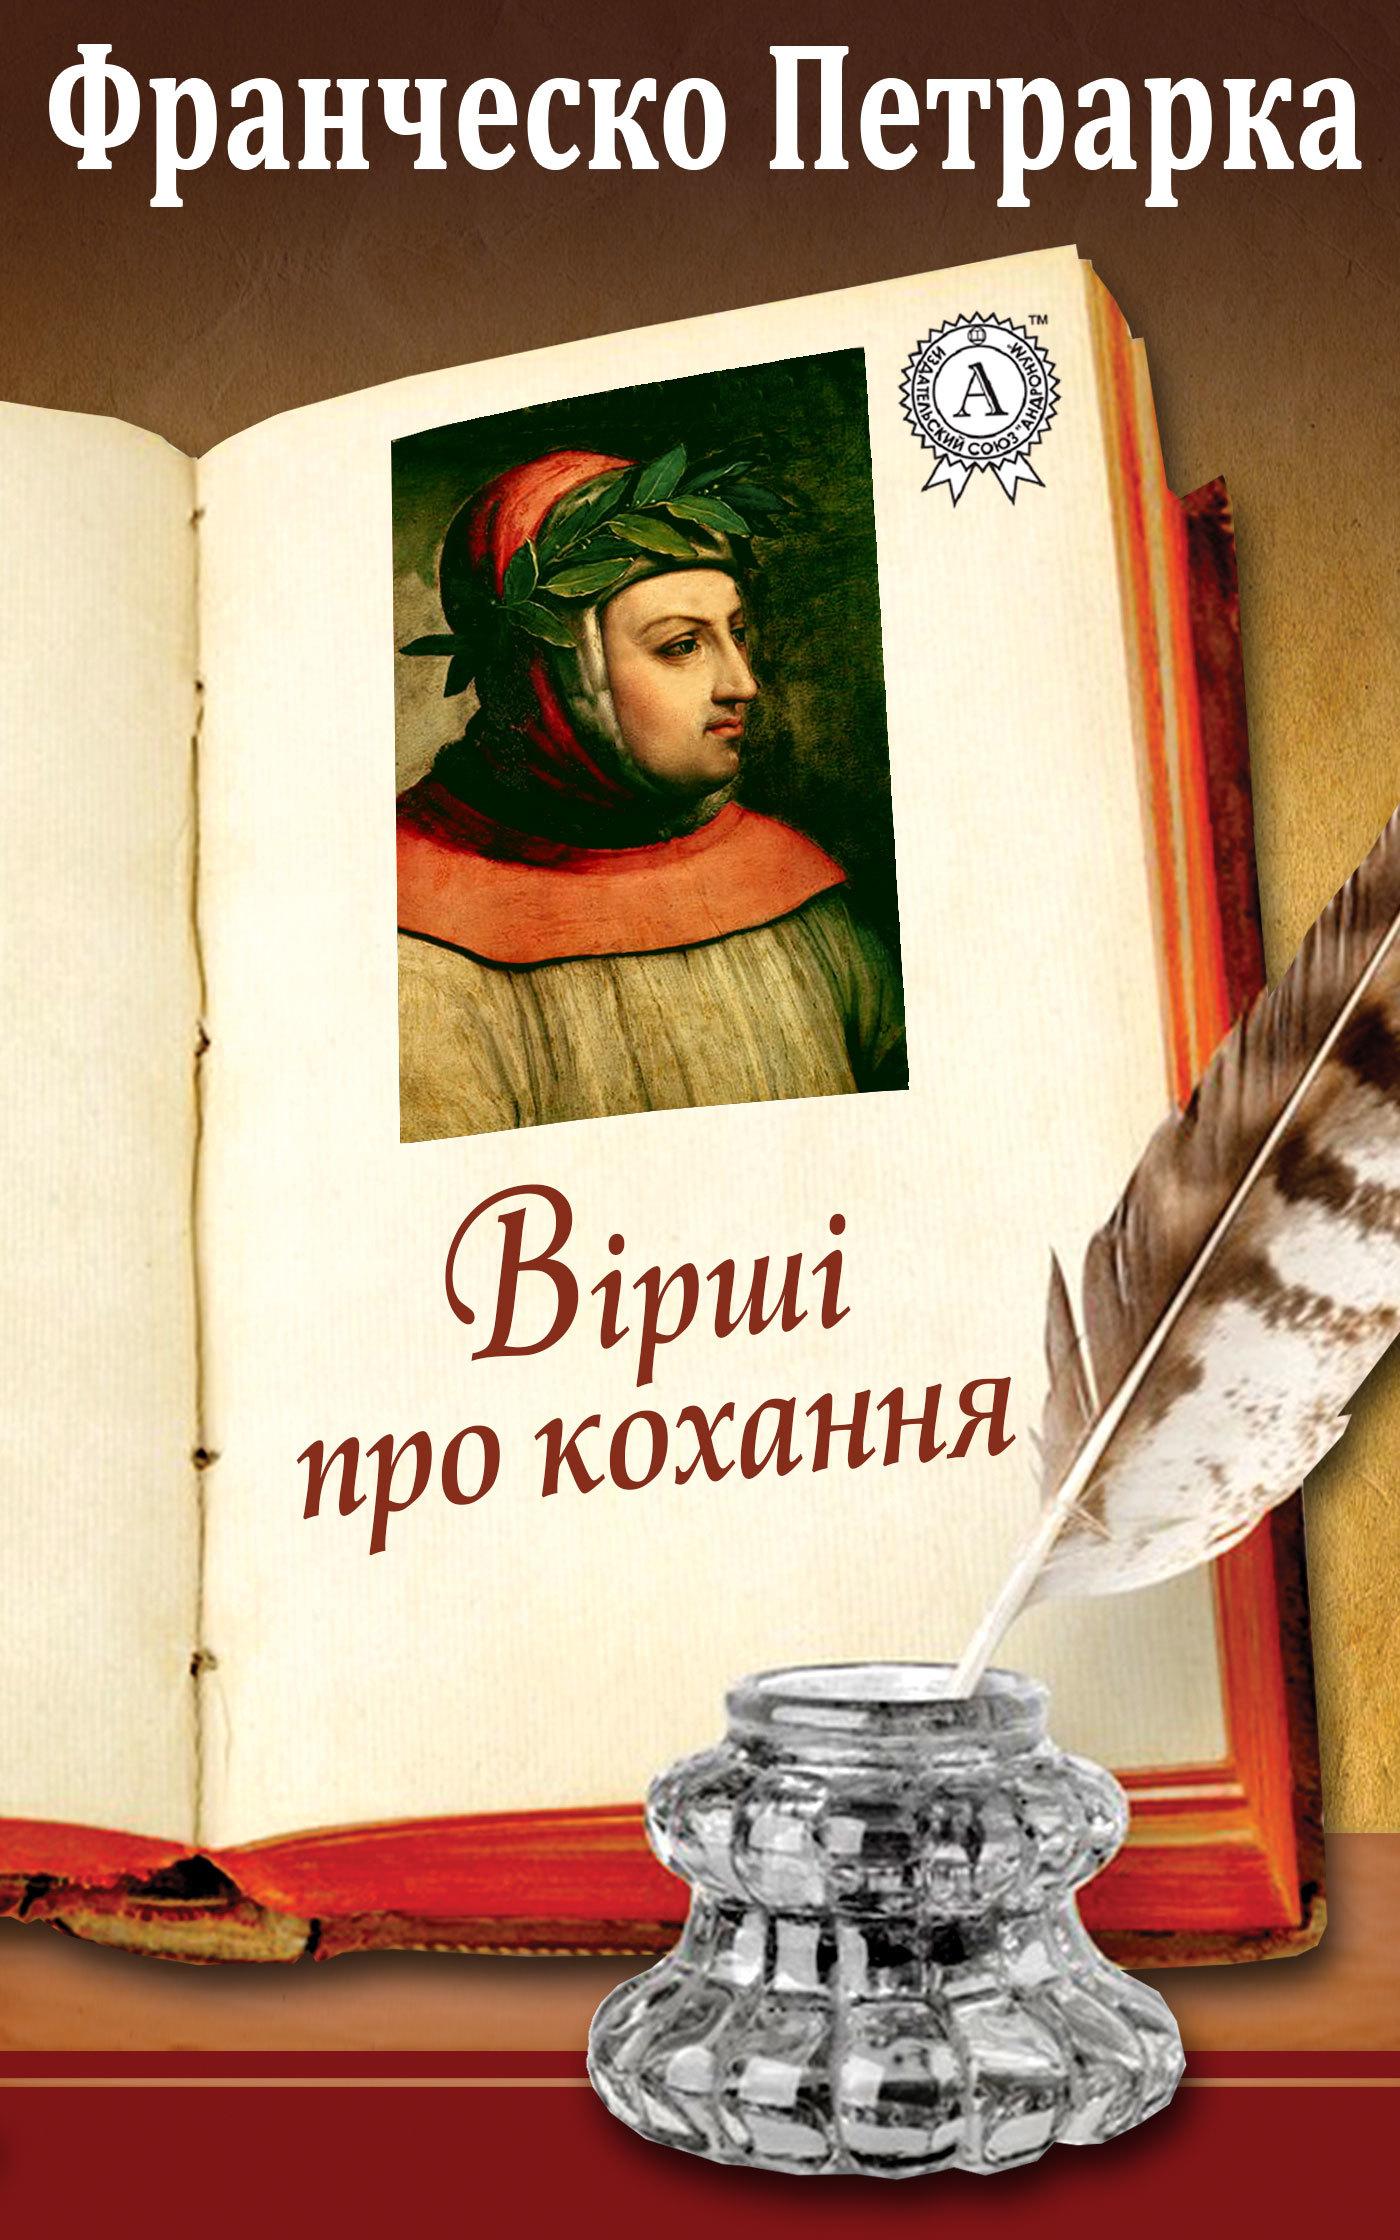 Франческо Петрарка бесплатно